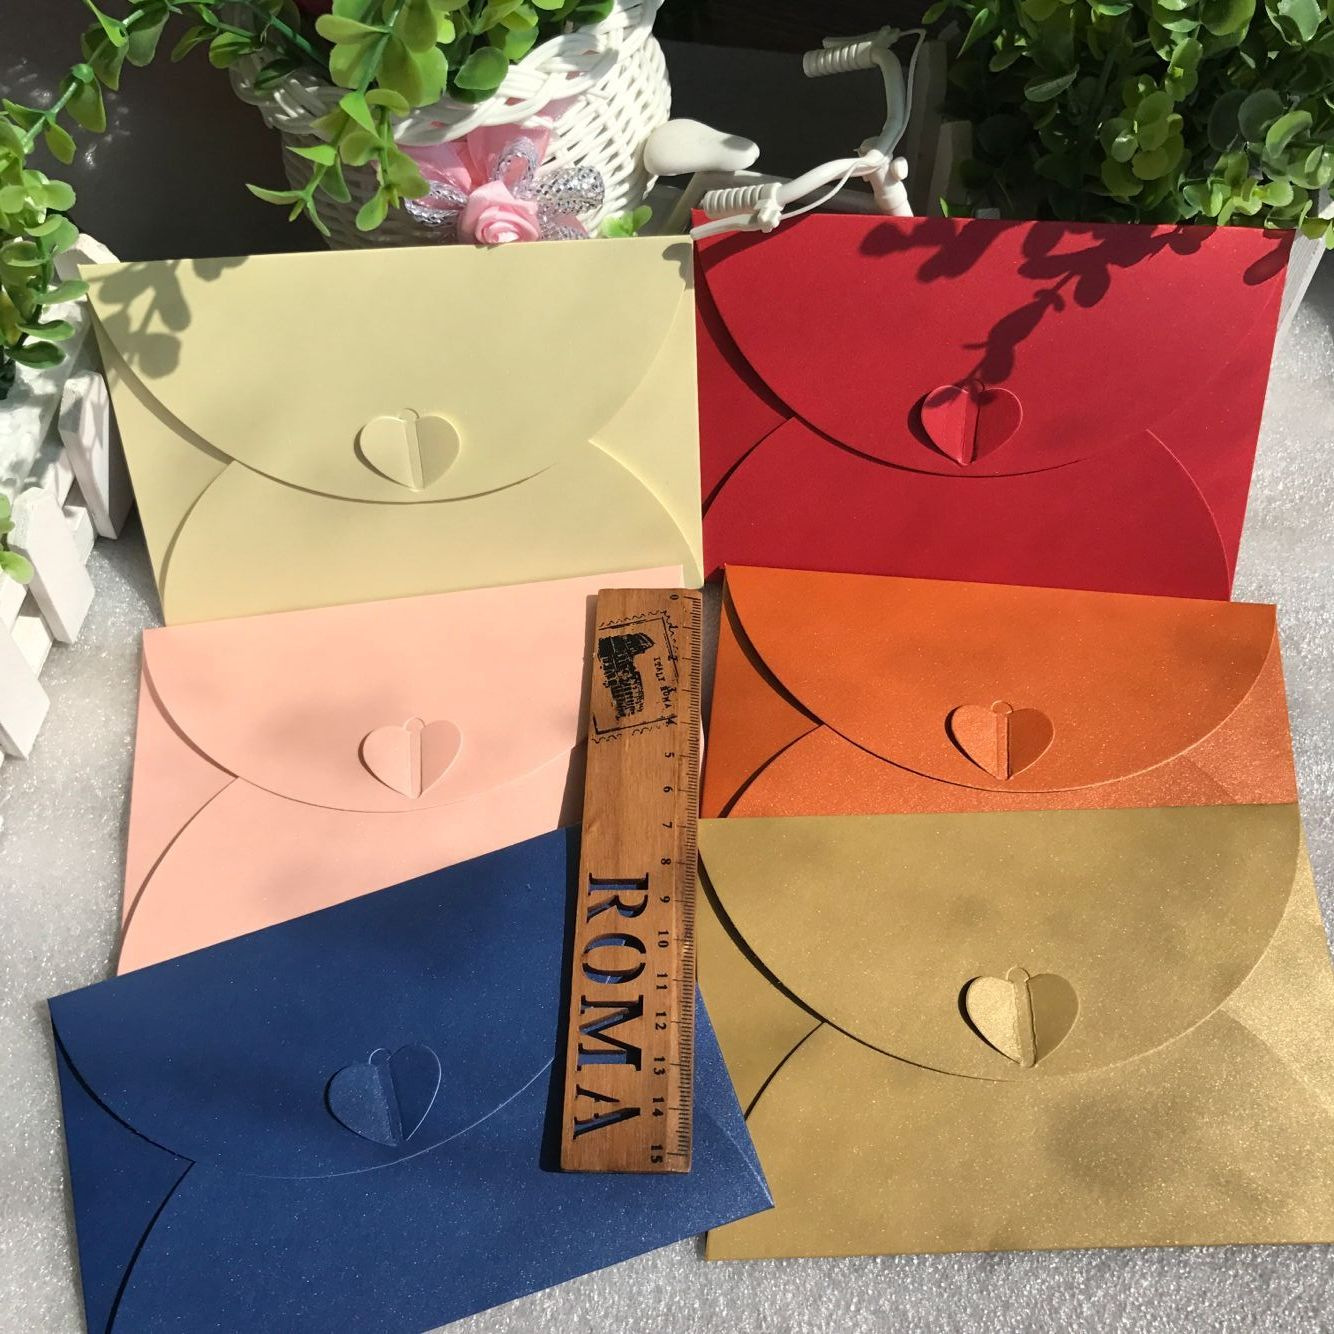 50 Pcs/lot Colorful Craft Paper Envelopes Vintage European Style Envelope For Card Scrapbooking Gift 17.5*11cm